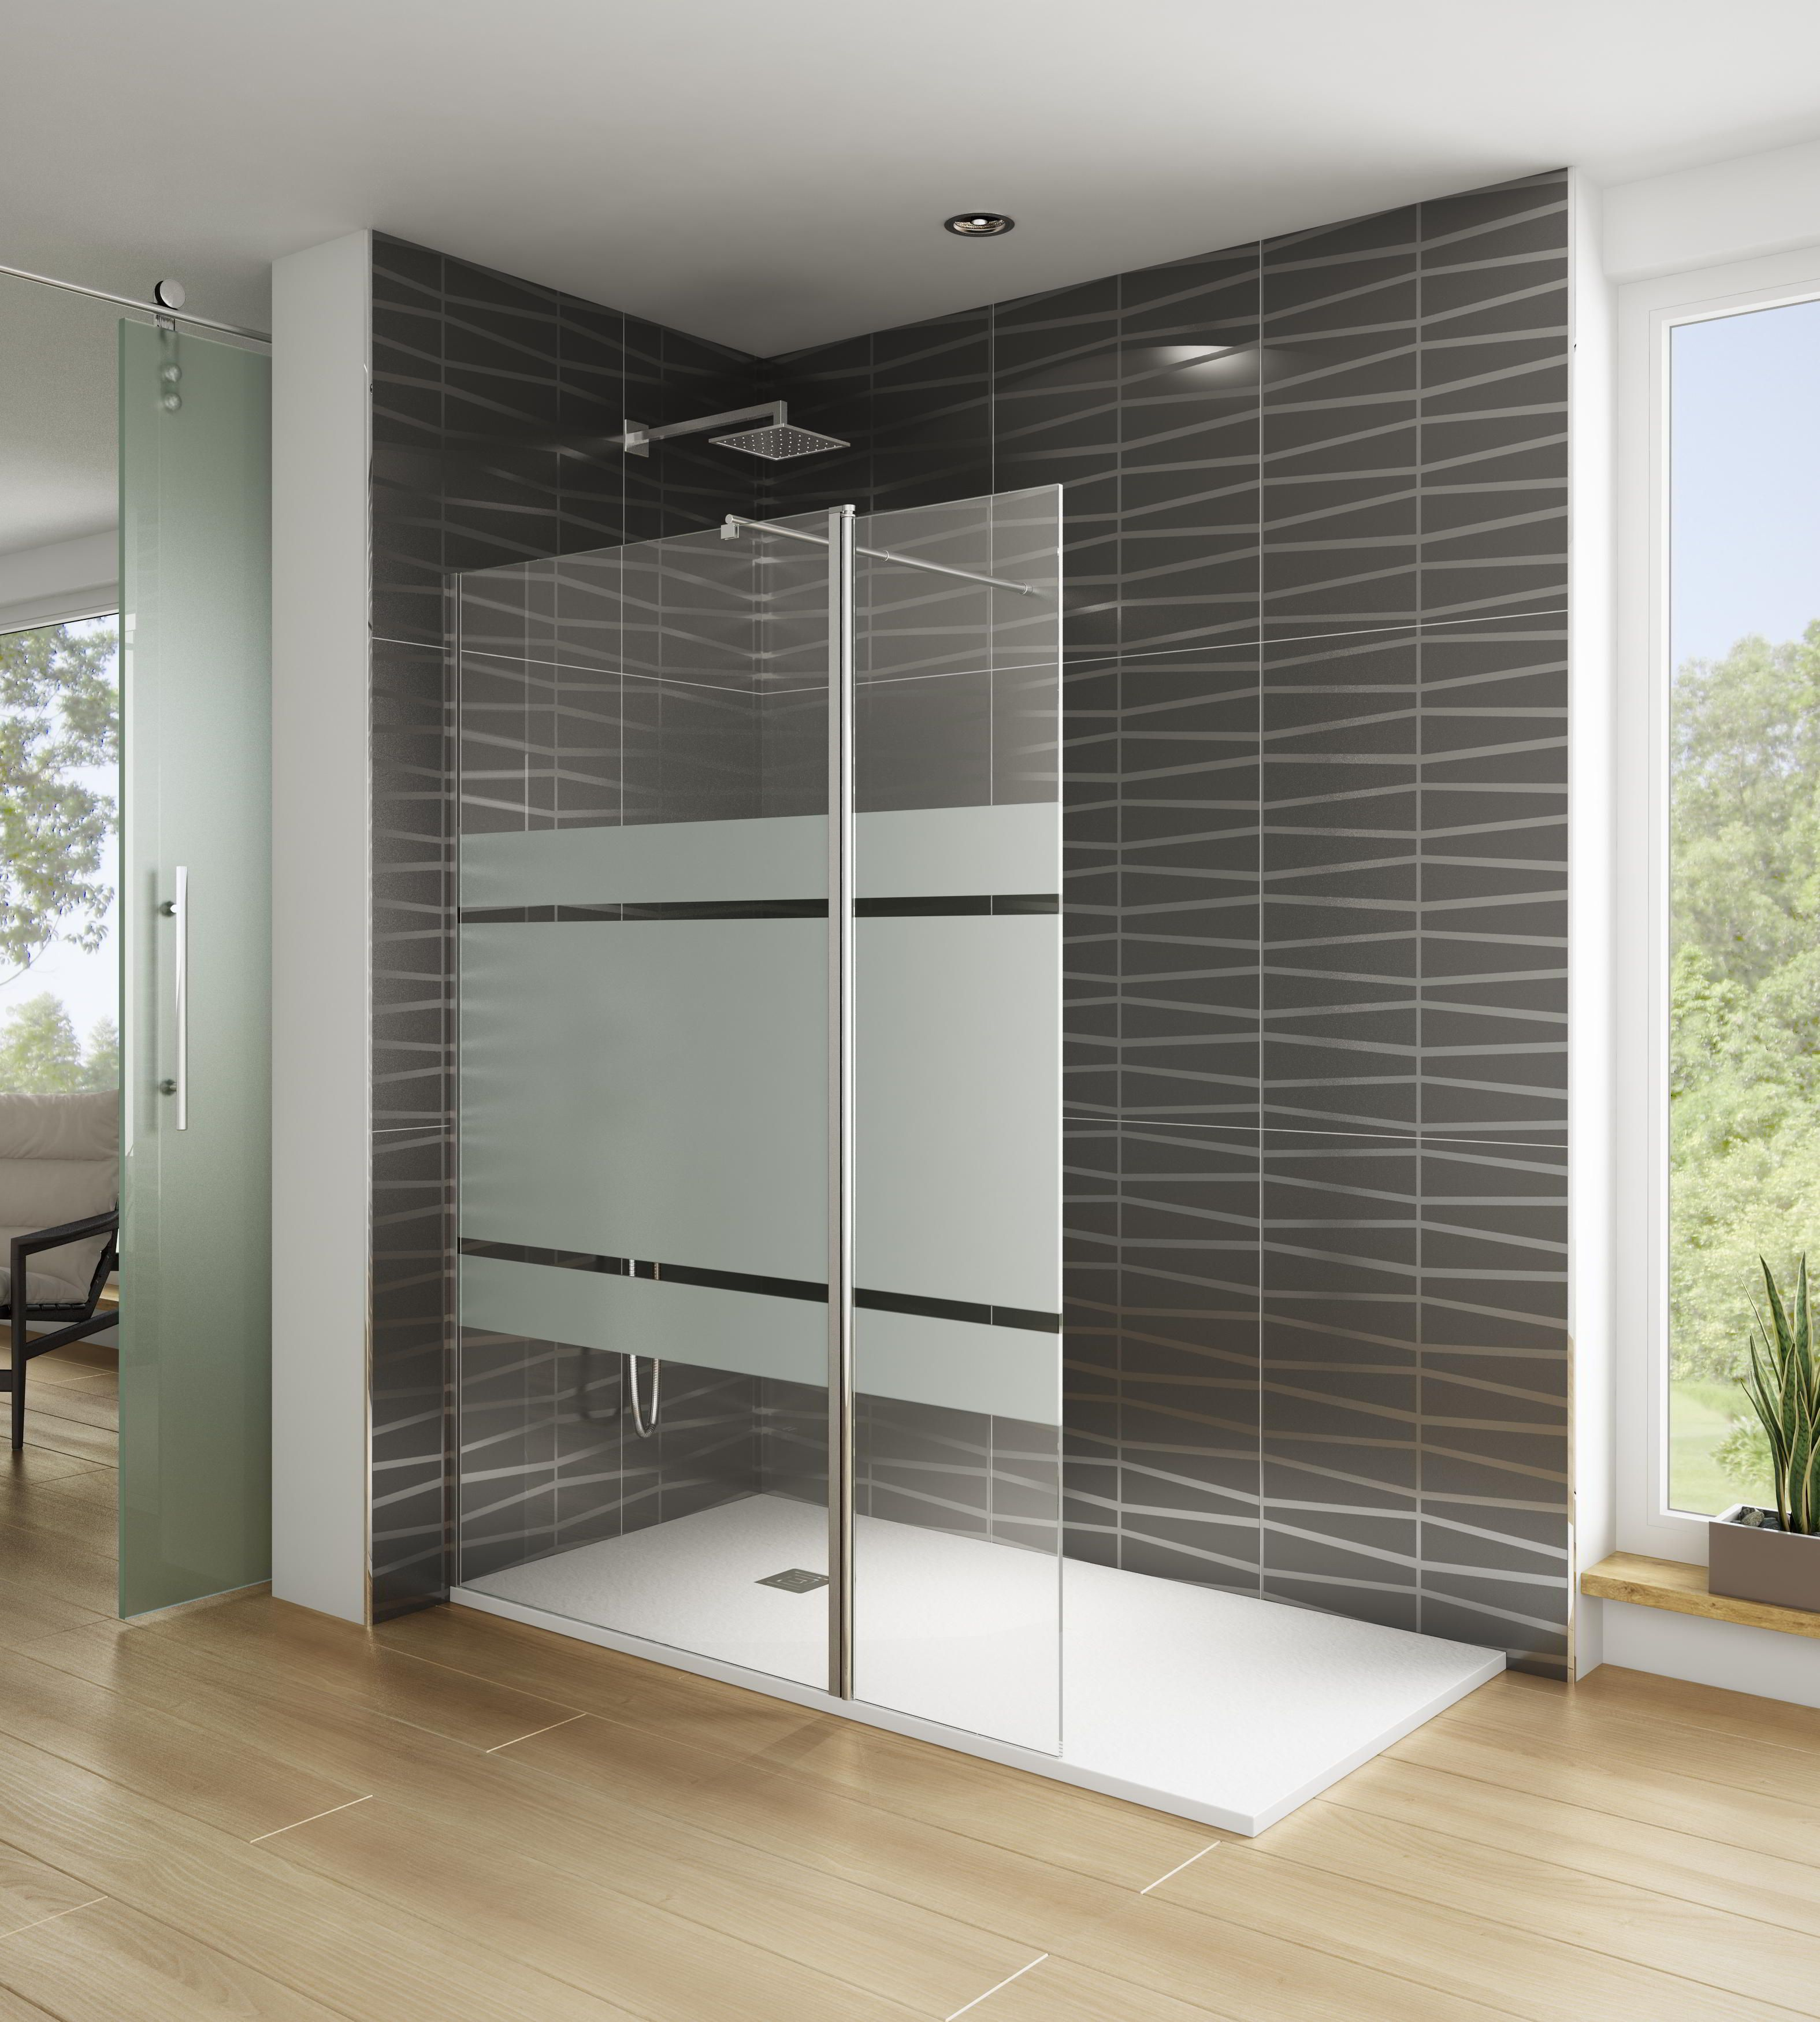 Mampara de ducha modelo screen abatible de 40 cm con - Mamparas abatibles para ducha ...